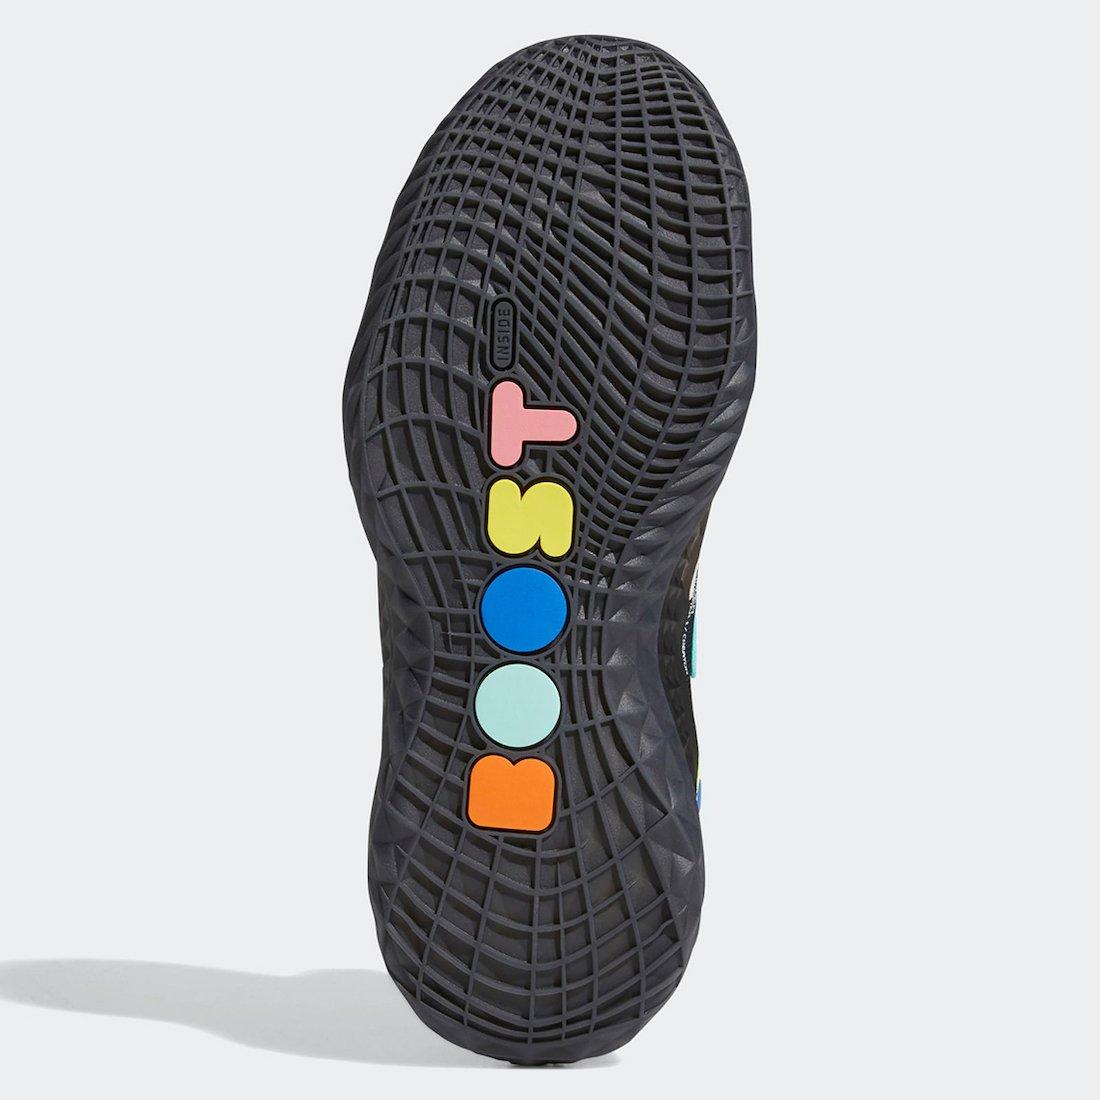 adidas Harden Vol 5 Futurenatural Core Black FZ1070 Release Date Info